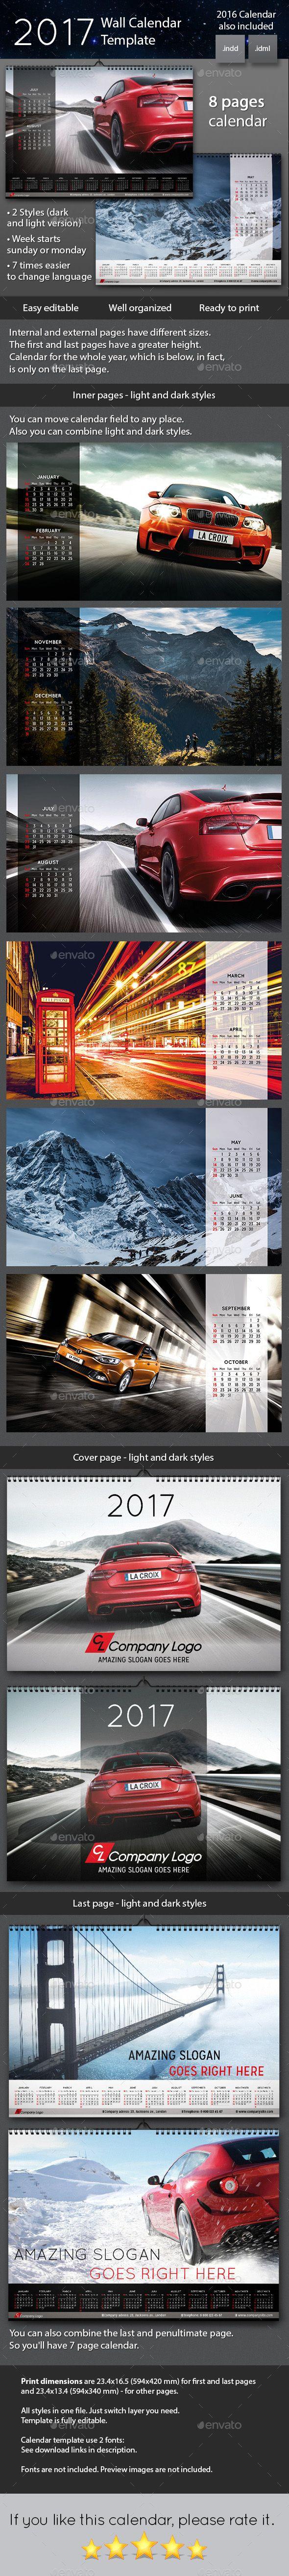 2017 Wall Calendar Calendars Stationery